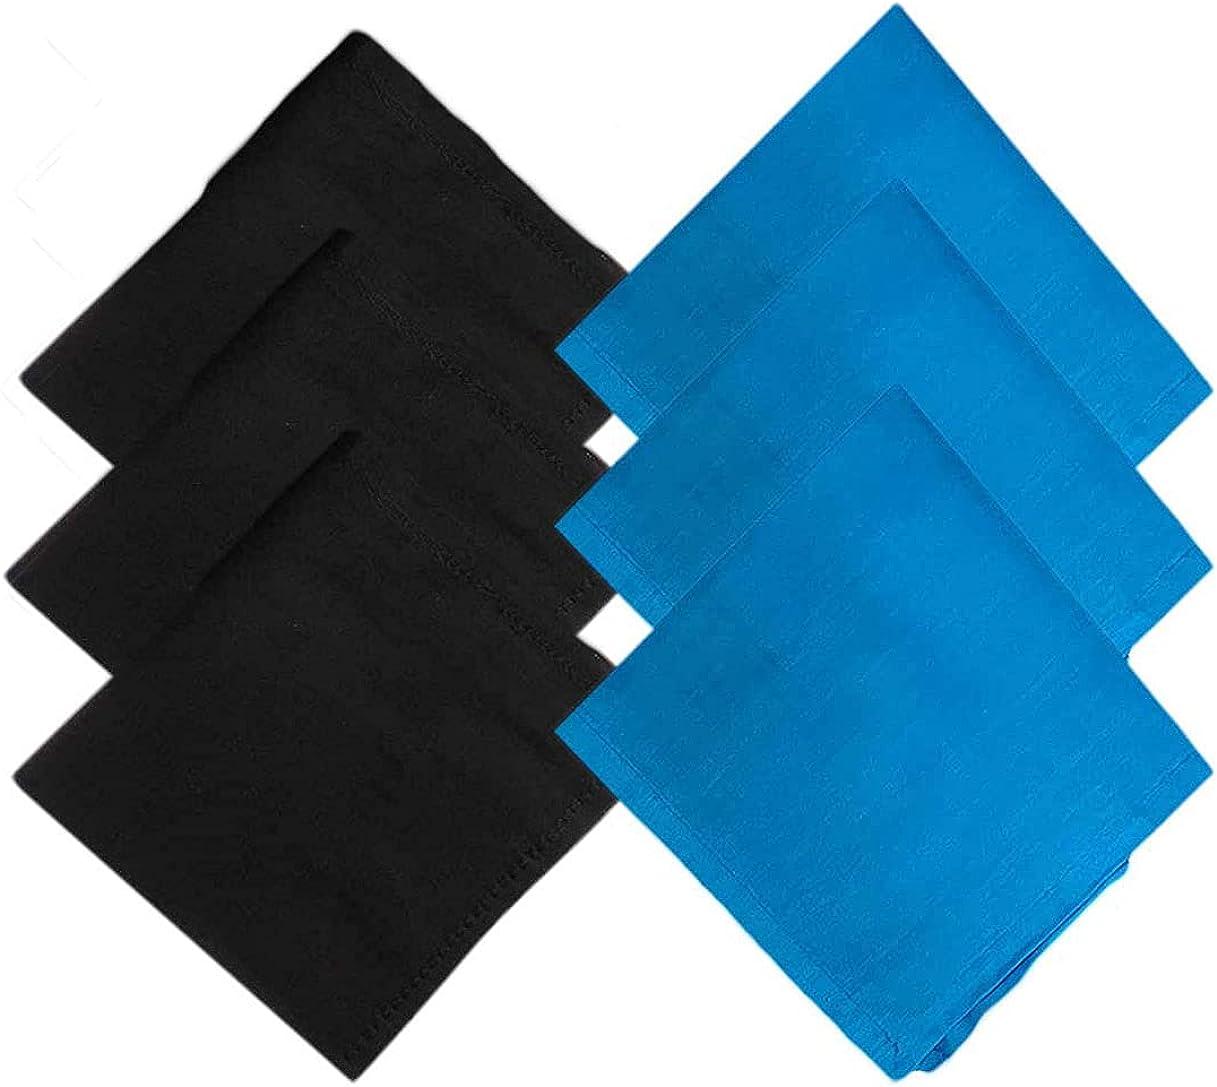 Kalagiri Cotton Premium Collection Black And Blue Handkerchiefs Hanky Set For Men - Pack of 6 Pcs